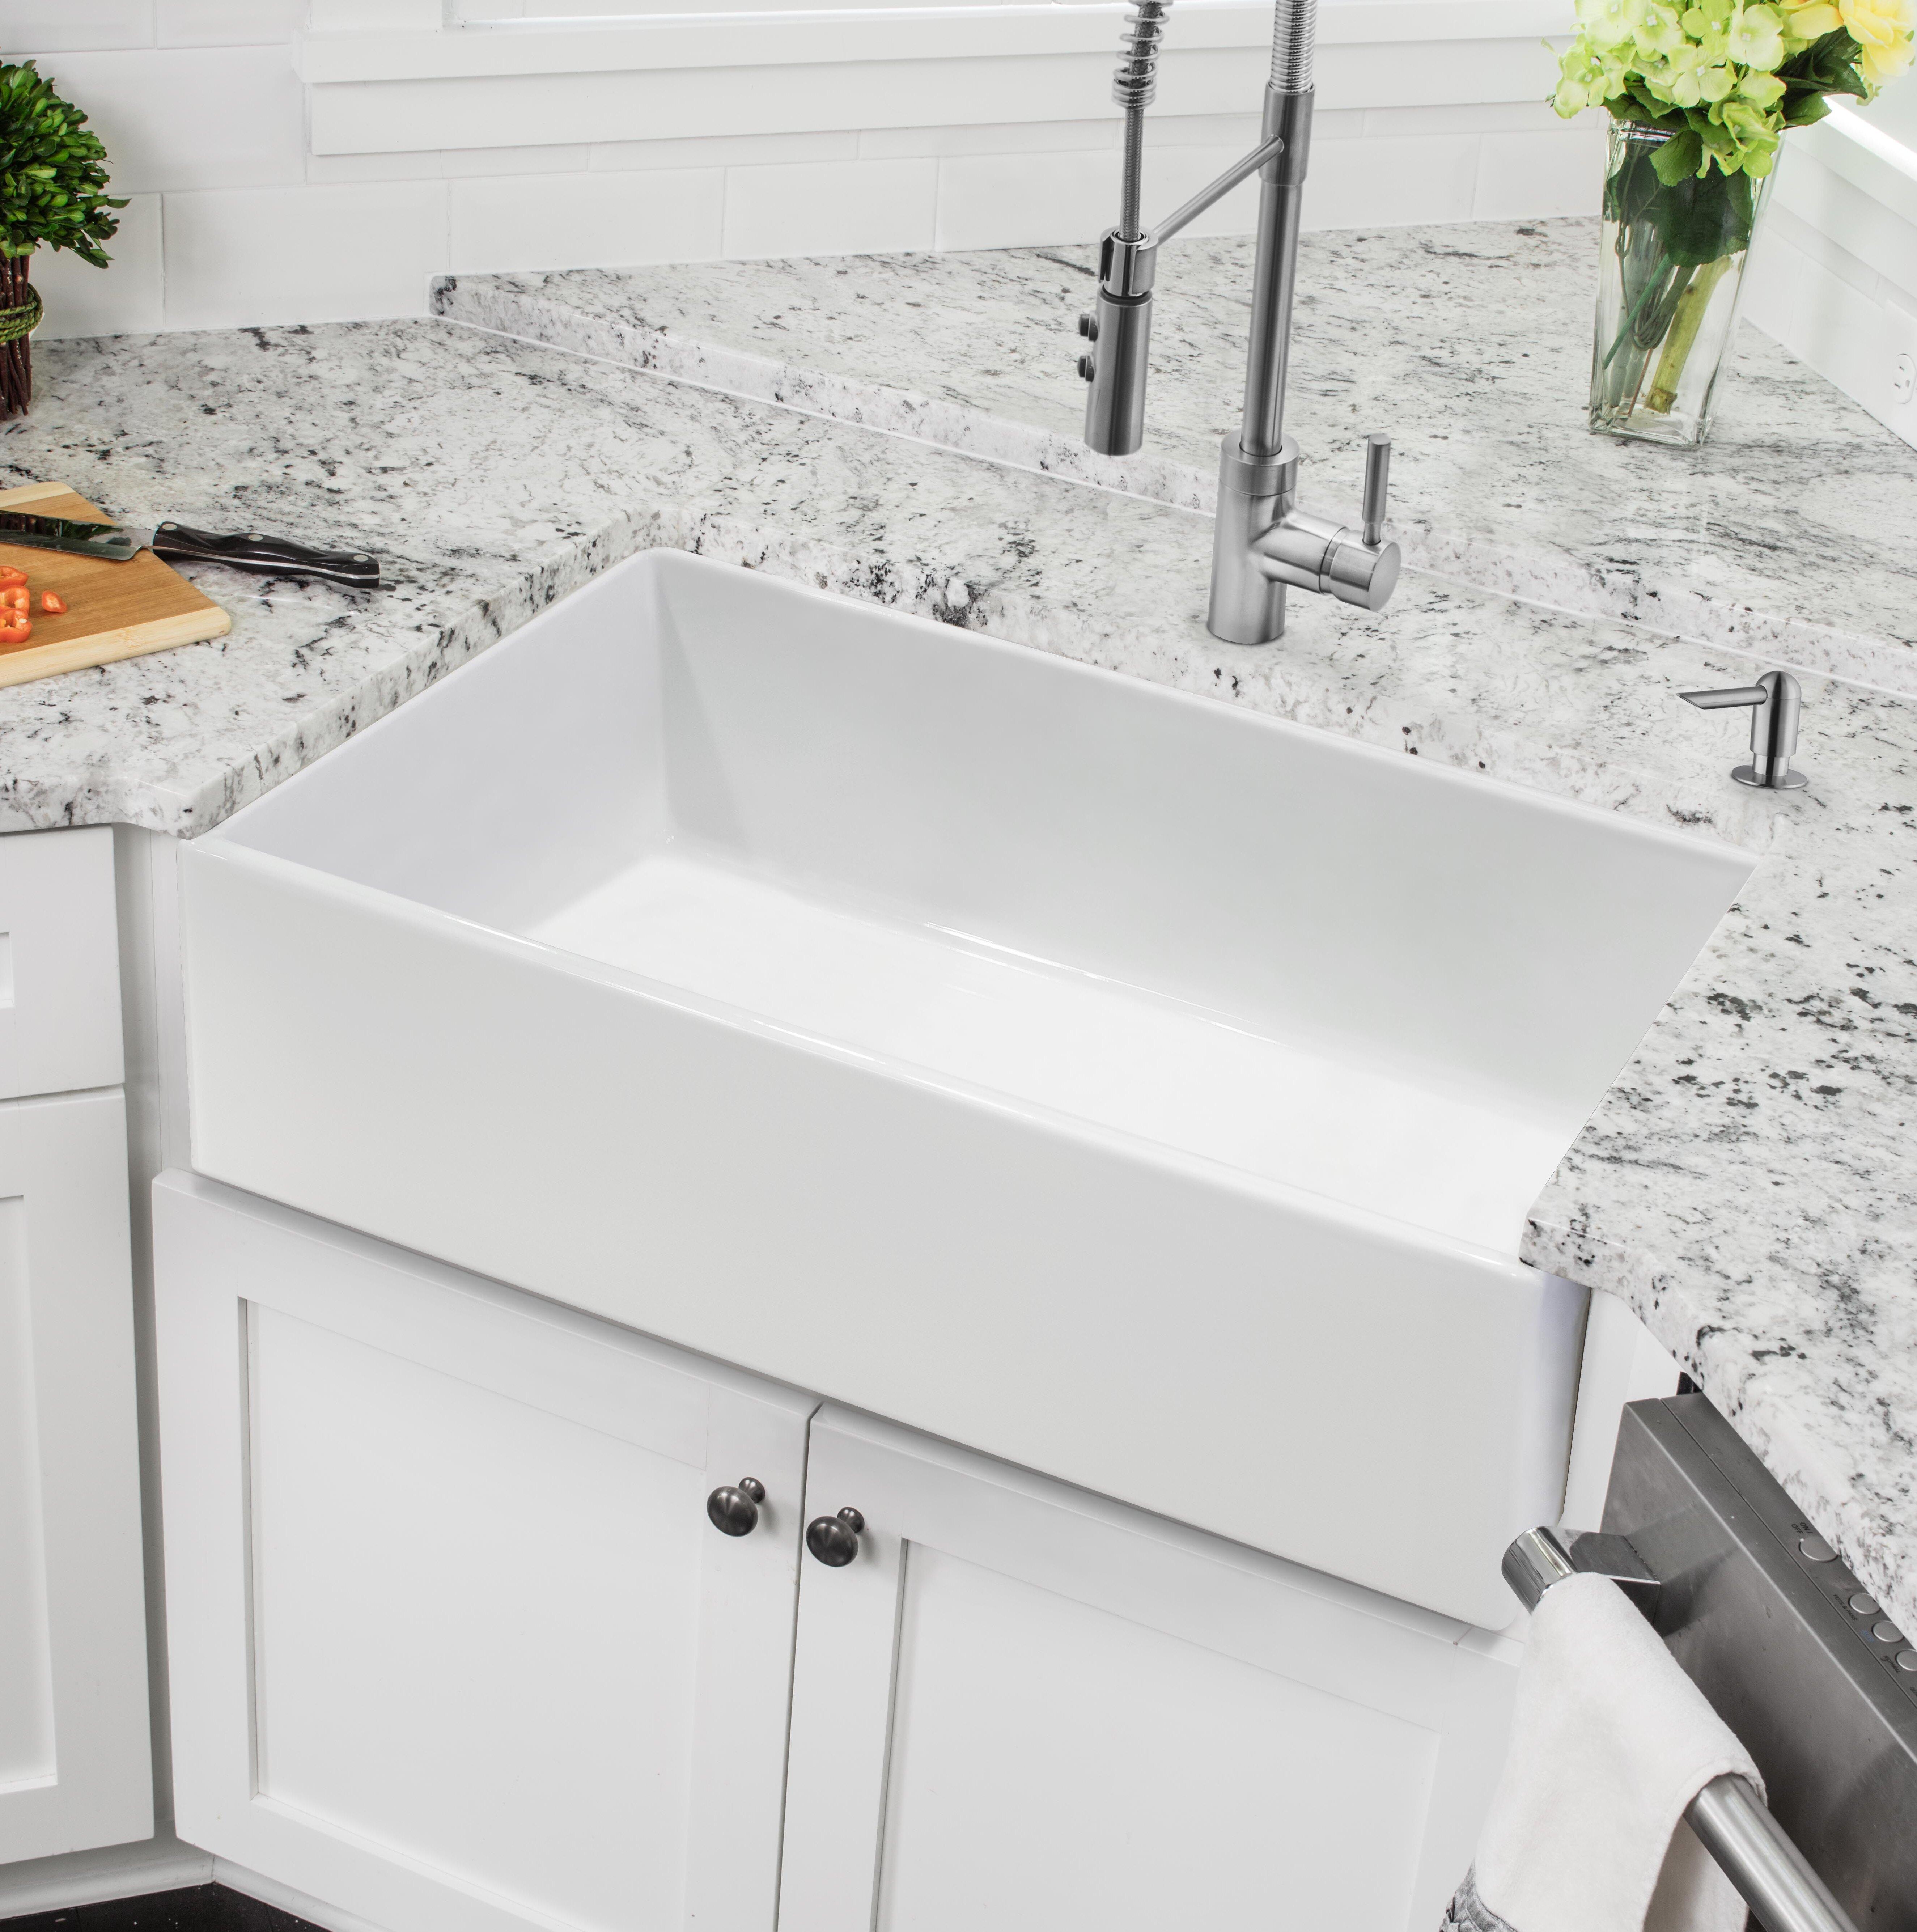 X 18 W Farmhouse Kitchen Sink